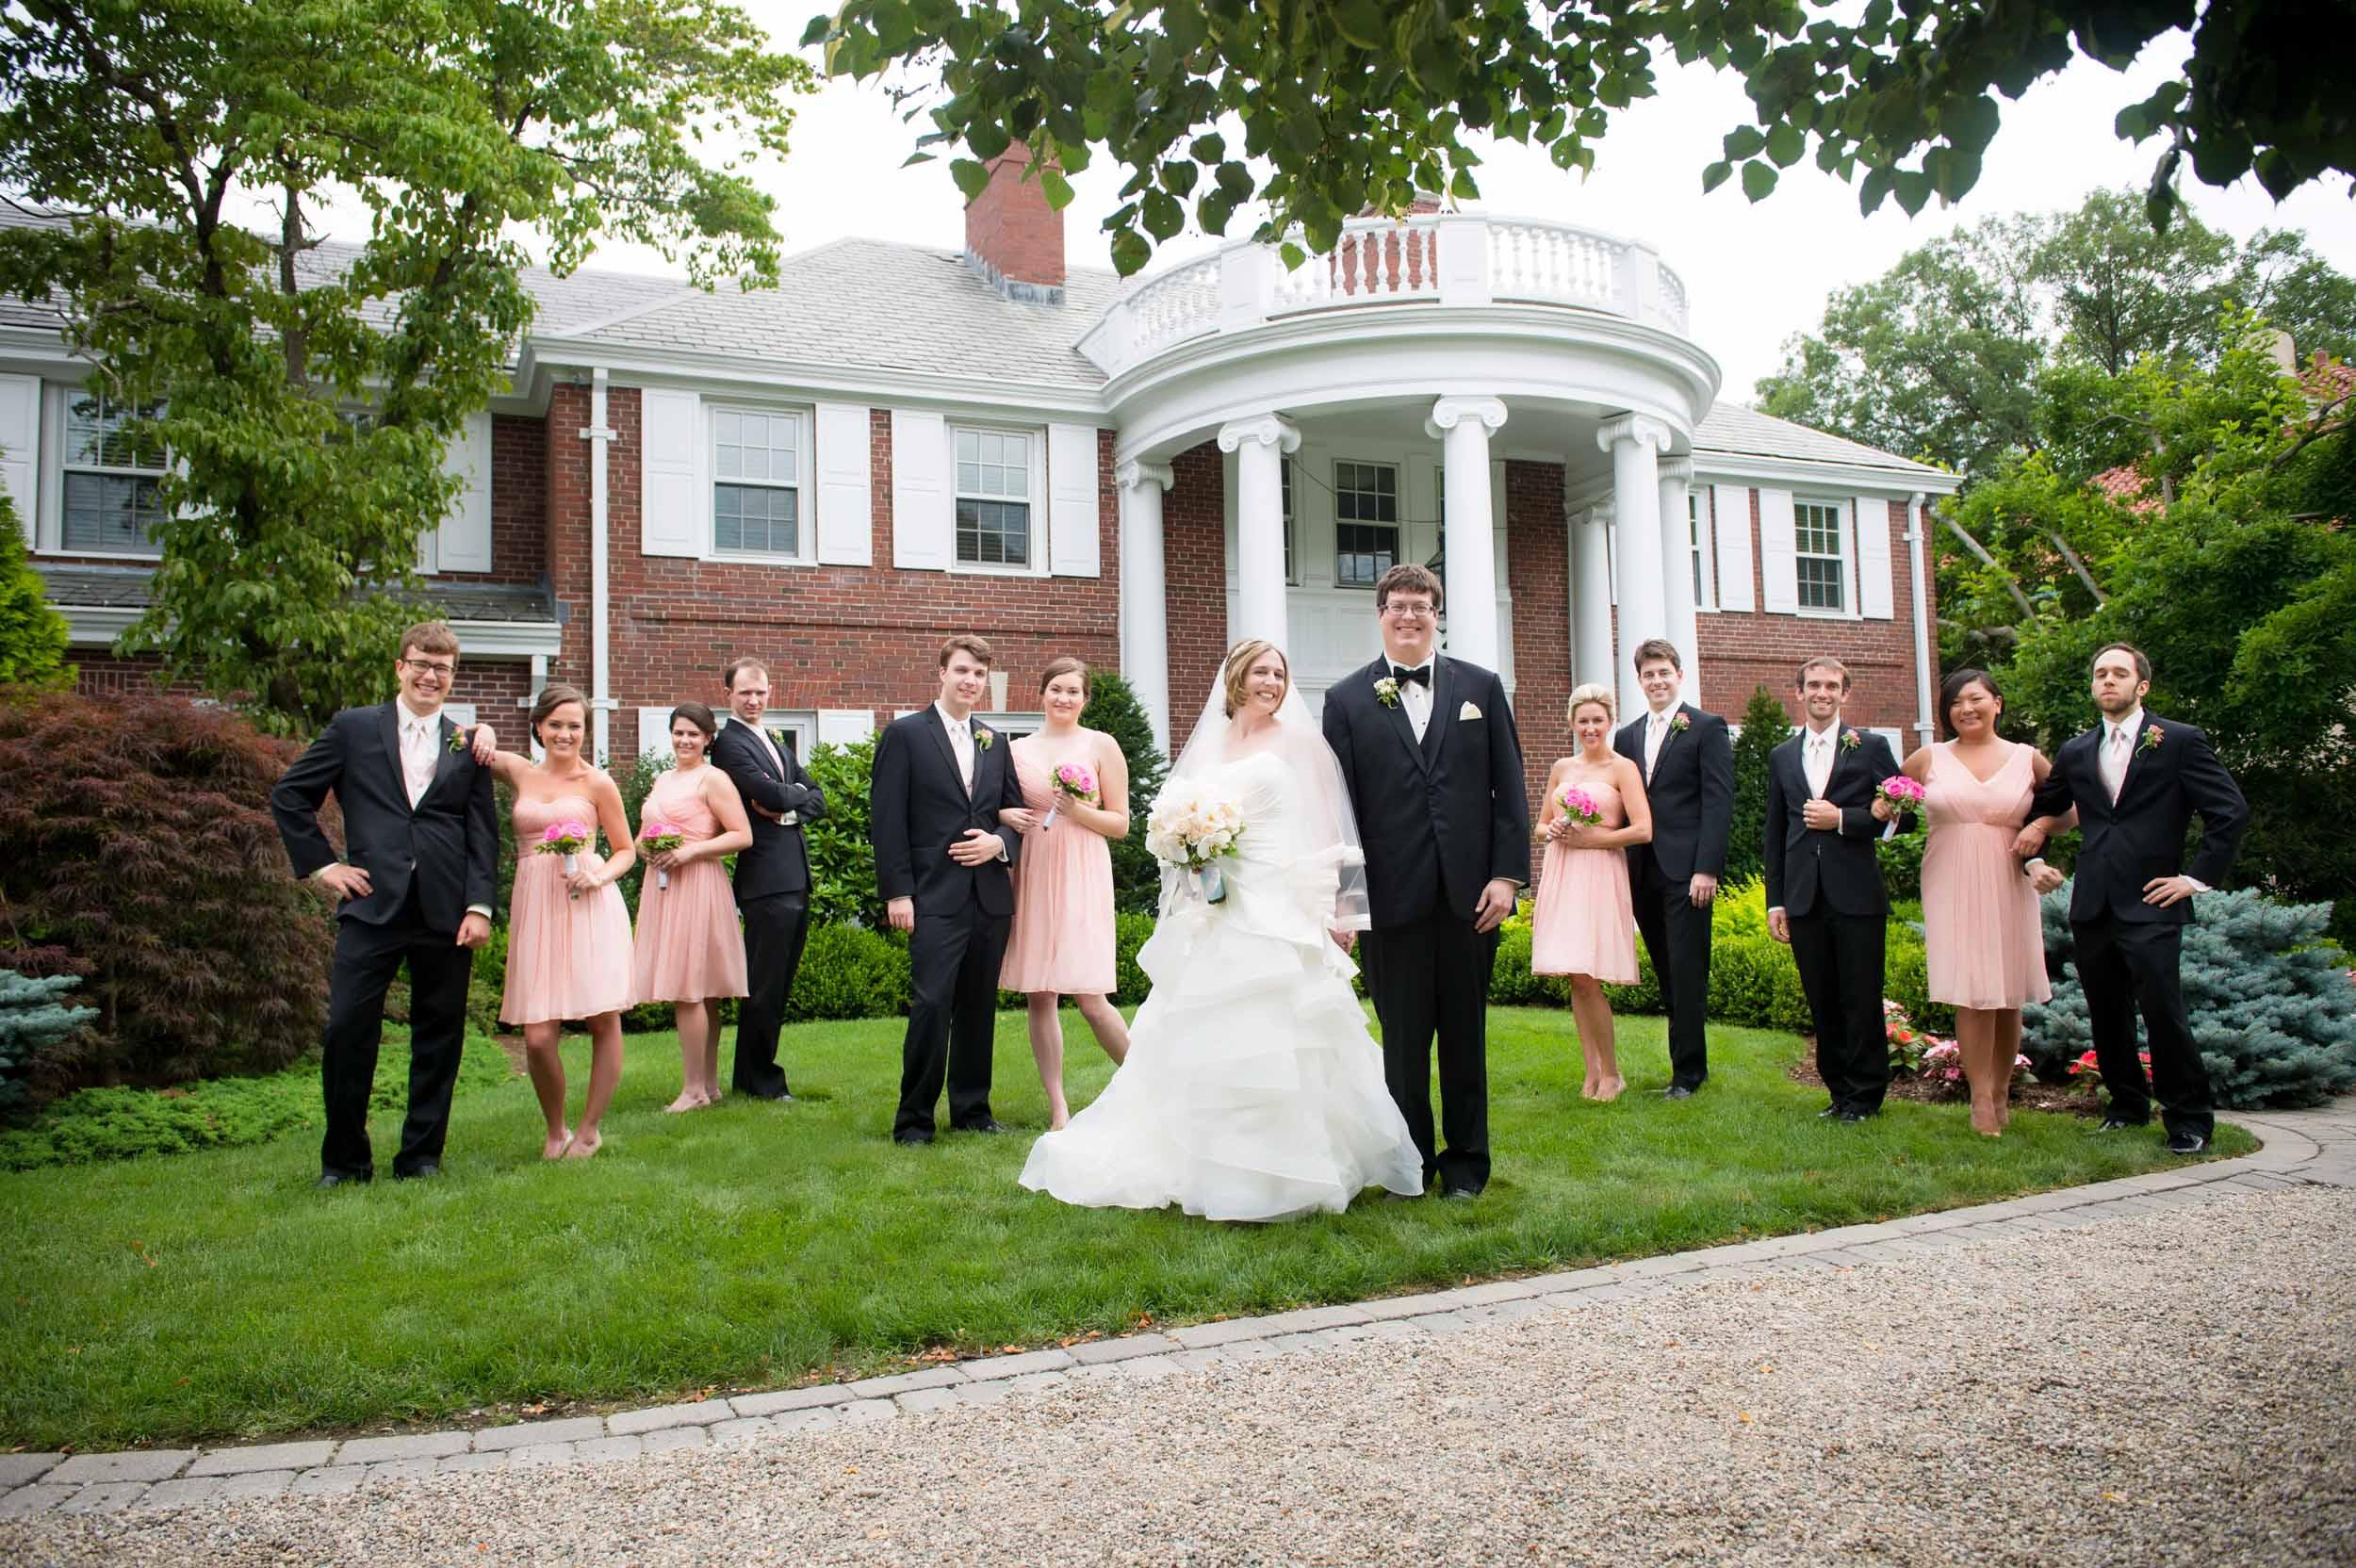 Wedding88KateTim 210*2-Edit-2.jpg